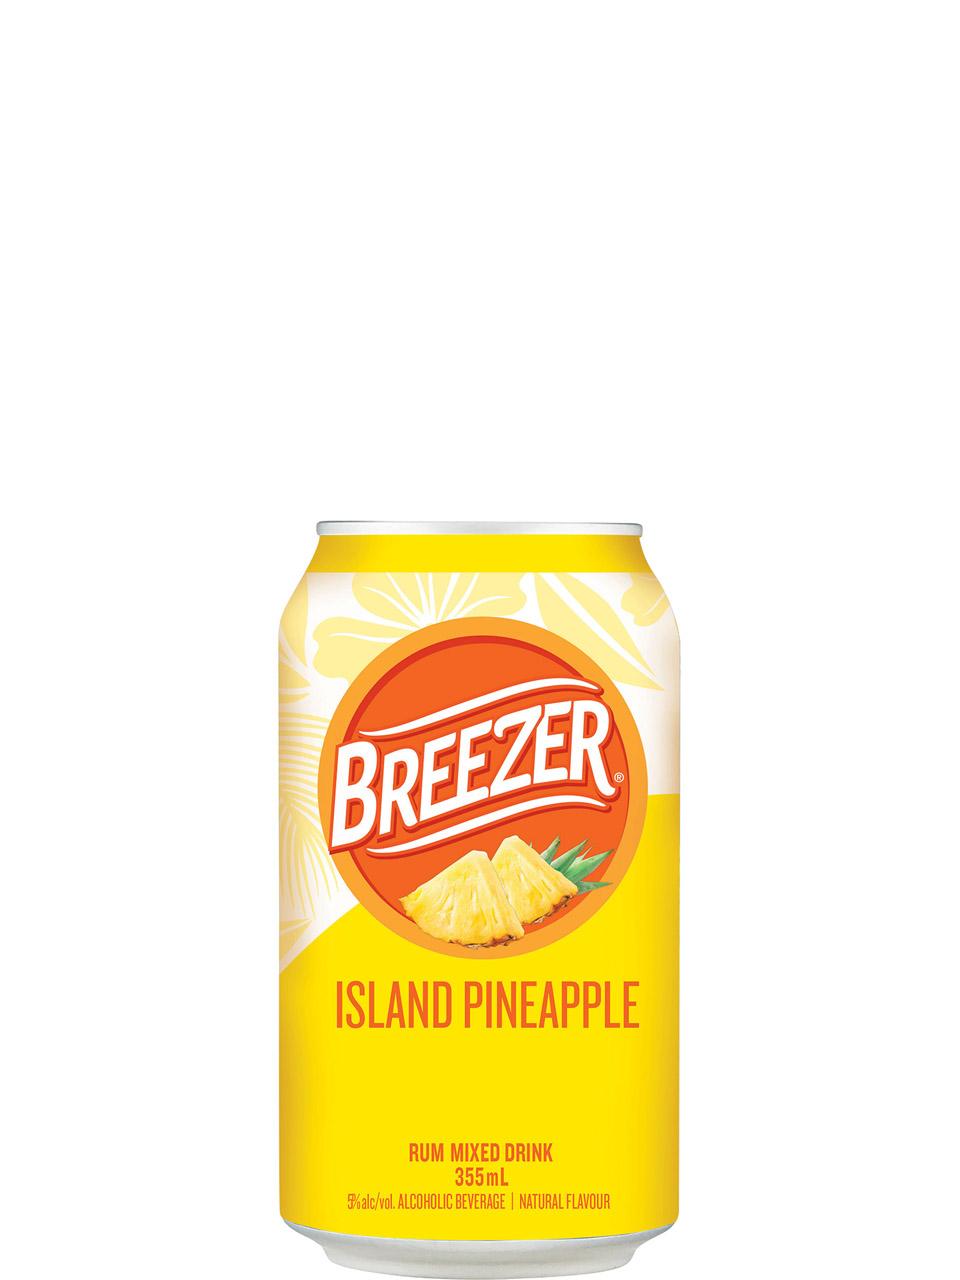 Breezer Island Pineapple 6pk Cans